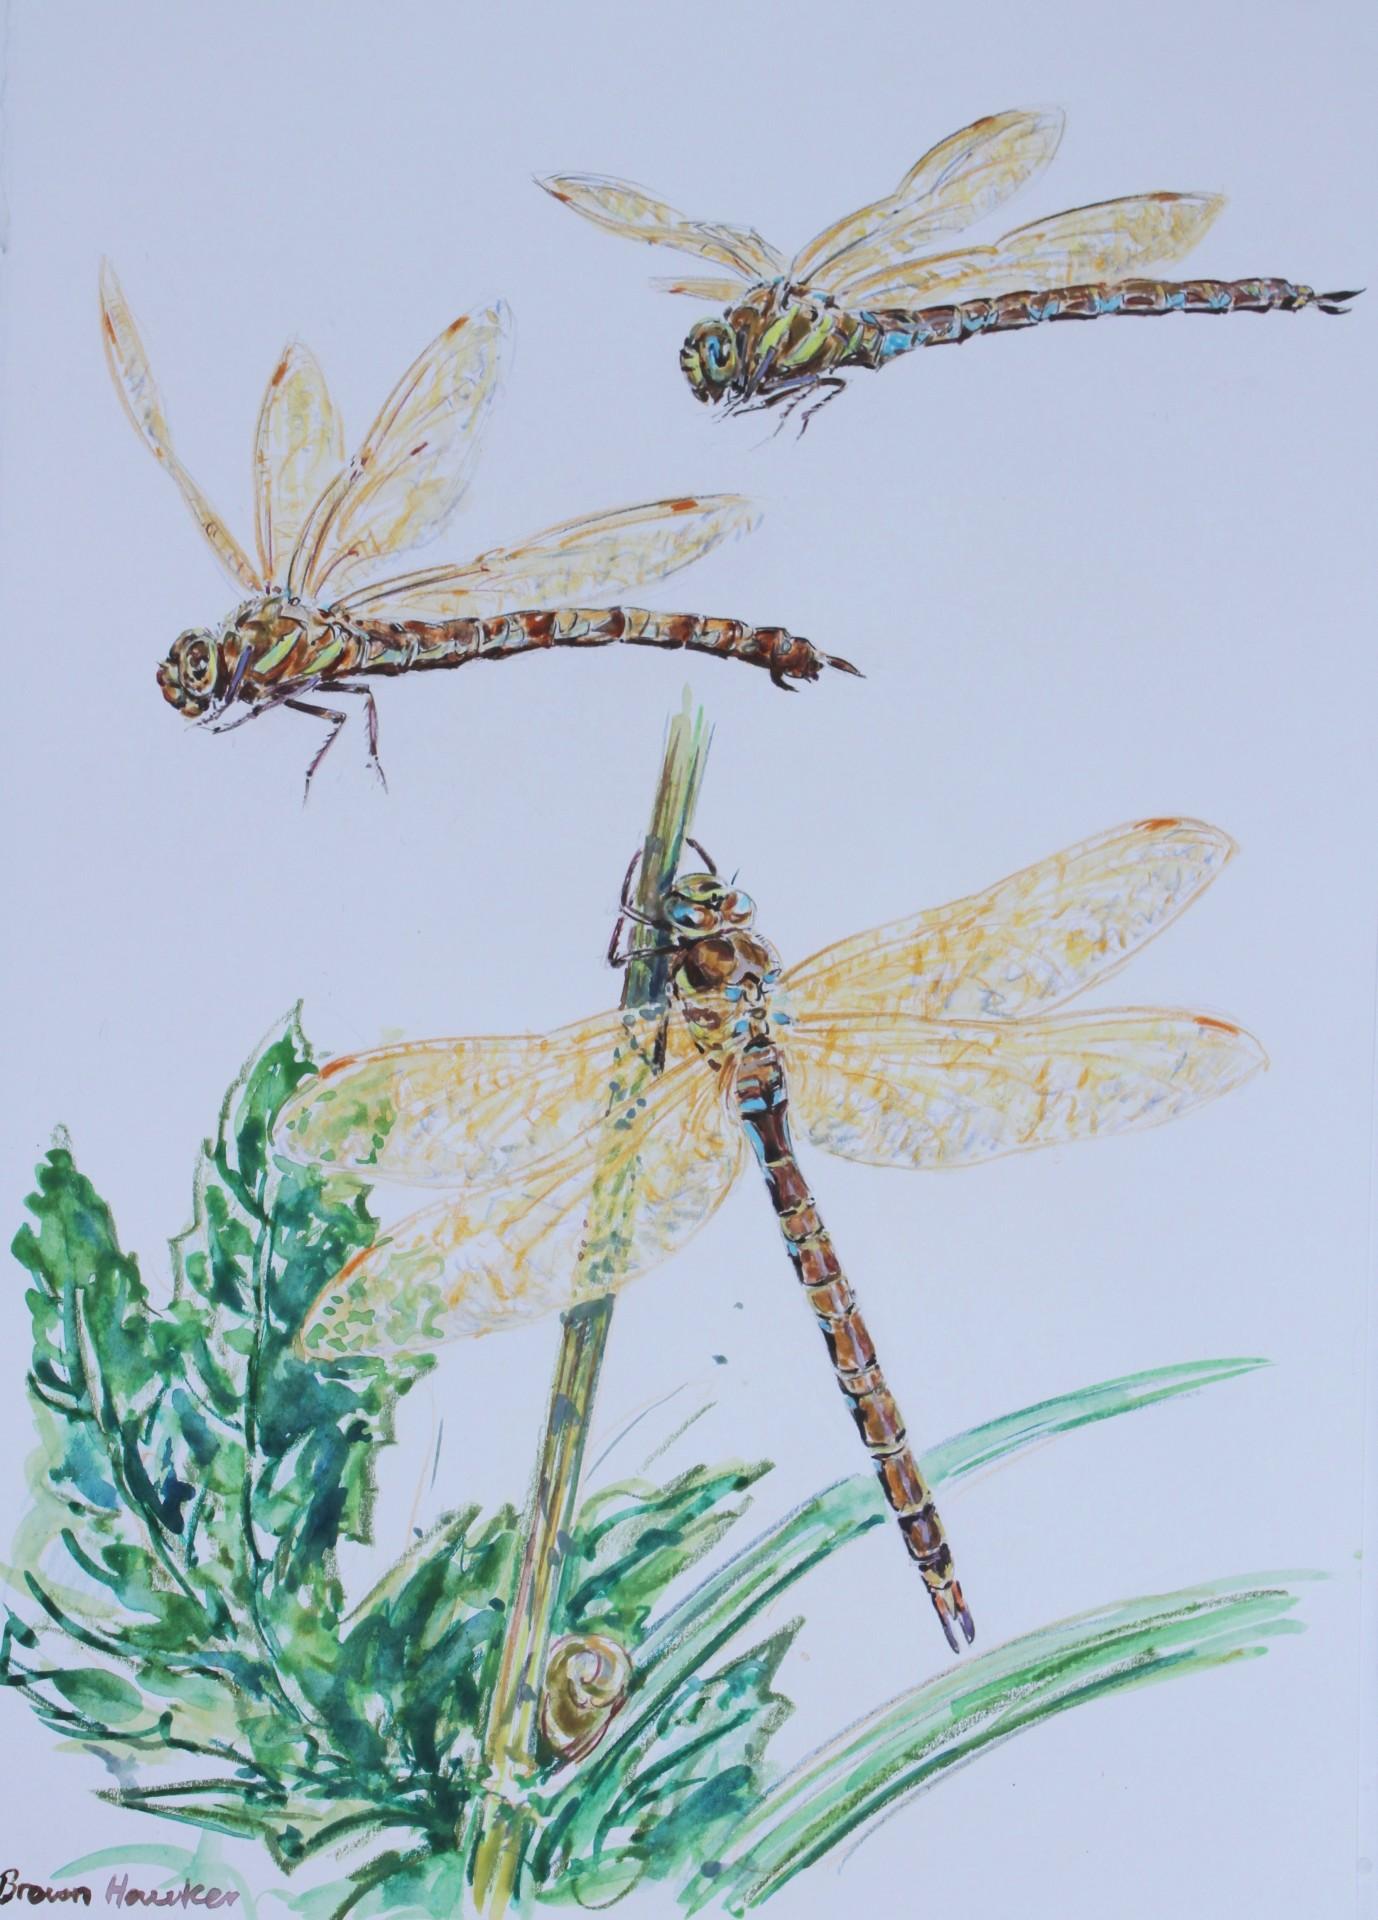 Brown Hawker Dragonfly Studies